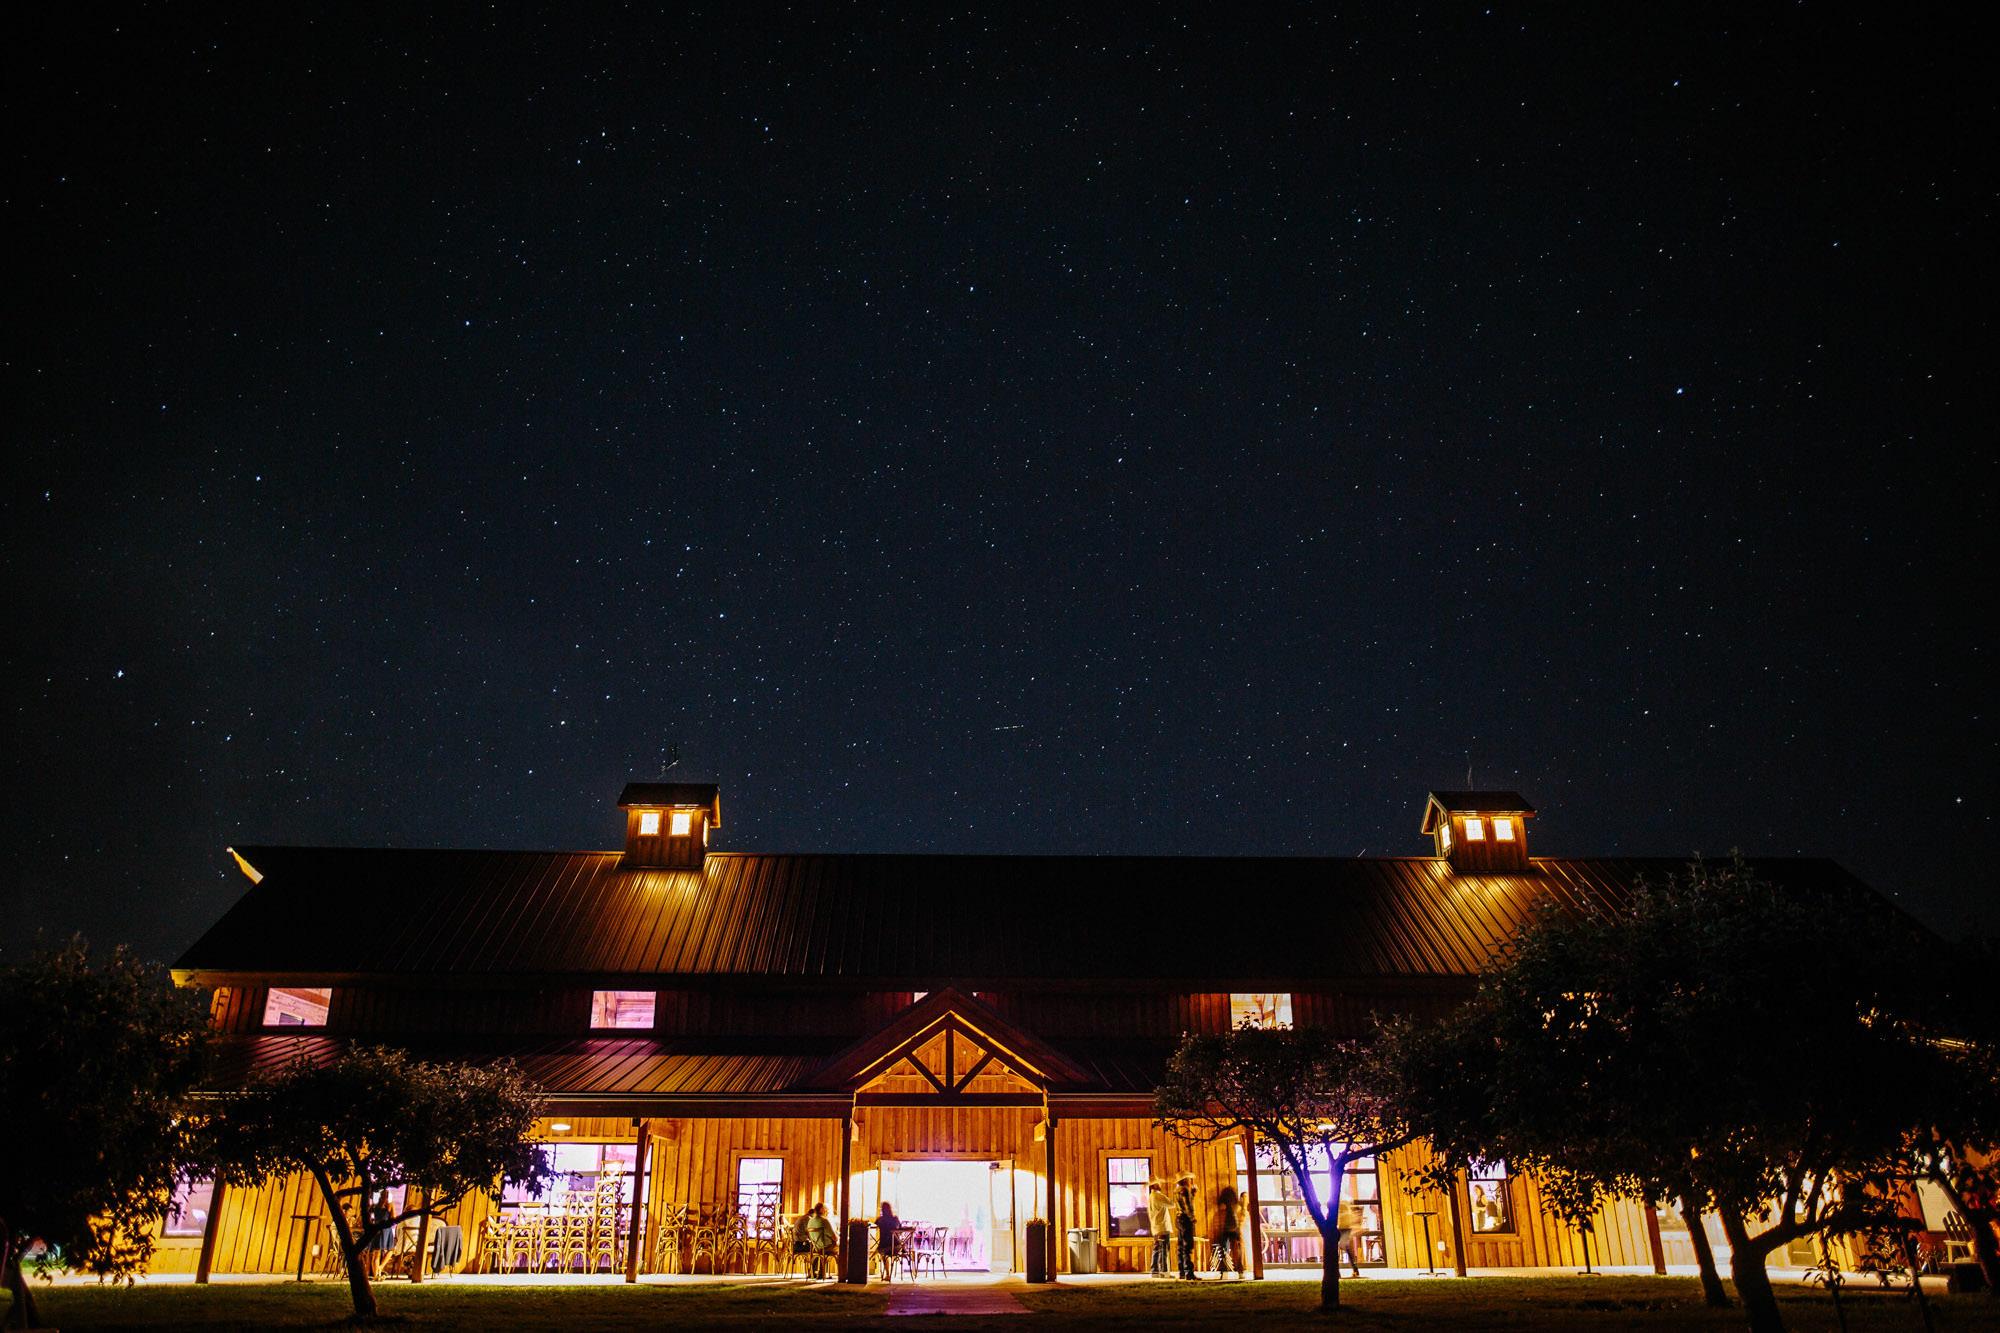 meadow-barn-wedding-sioux-falls-south-dakota-romantic-adventerous-michael-liedtke-photography138.jpg